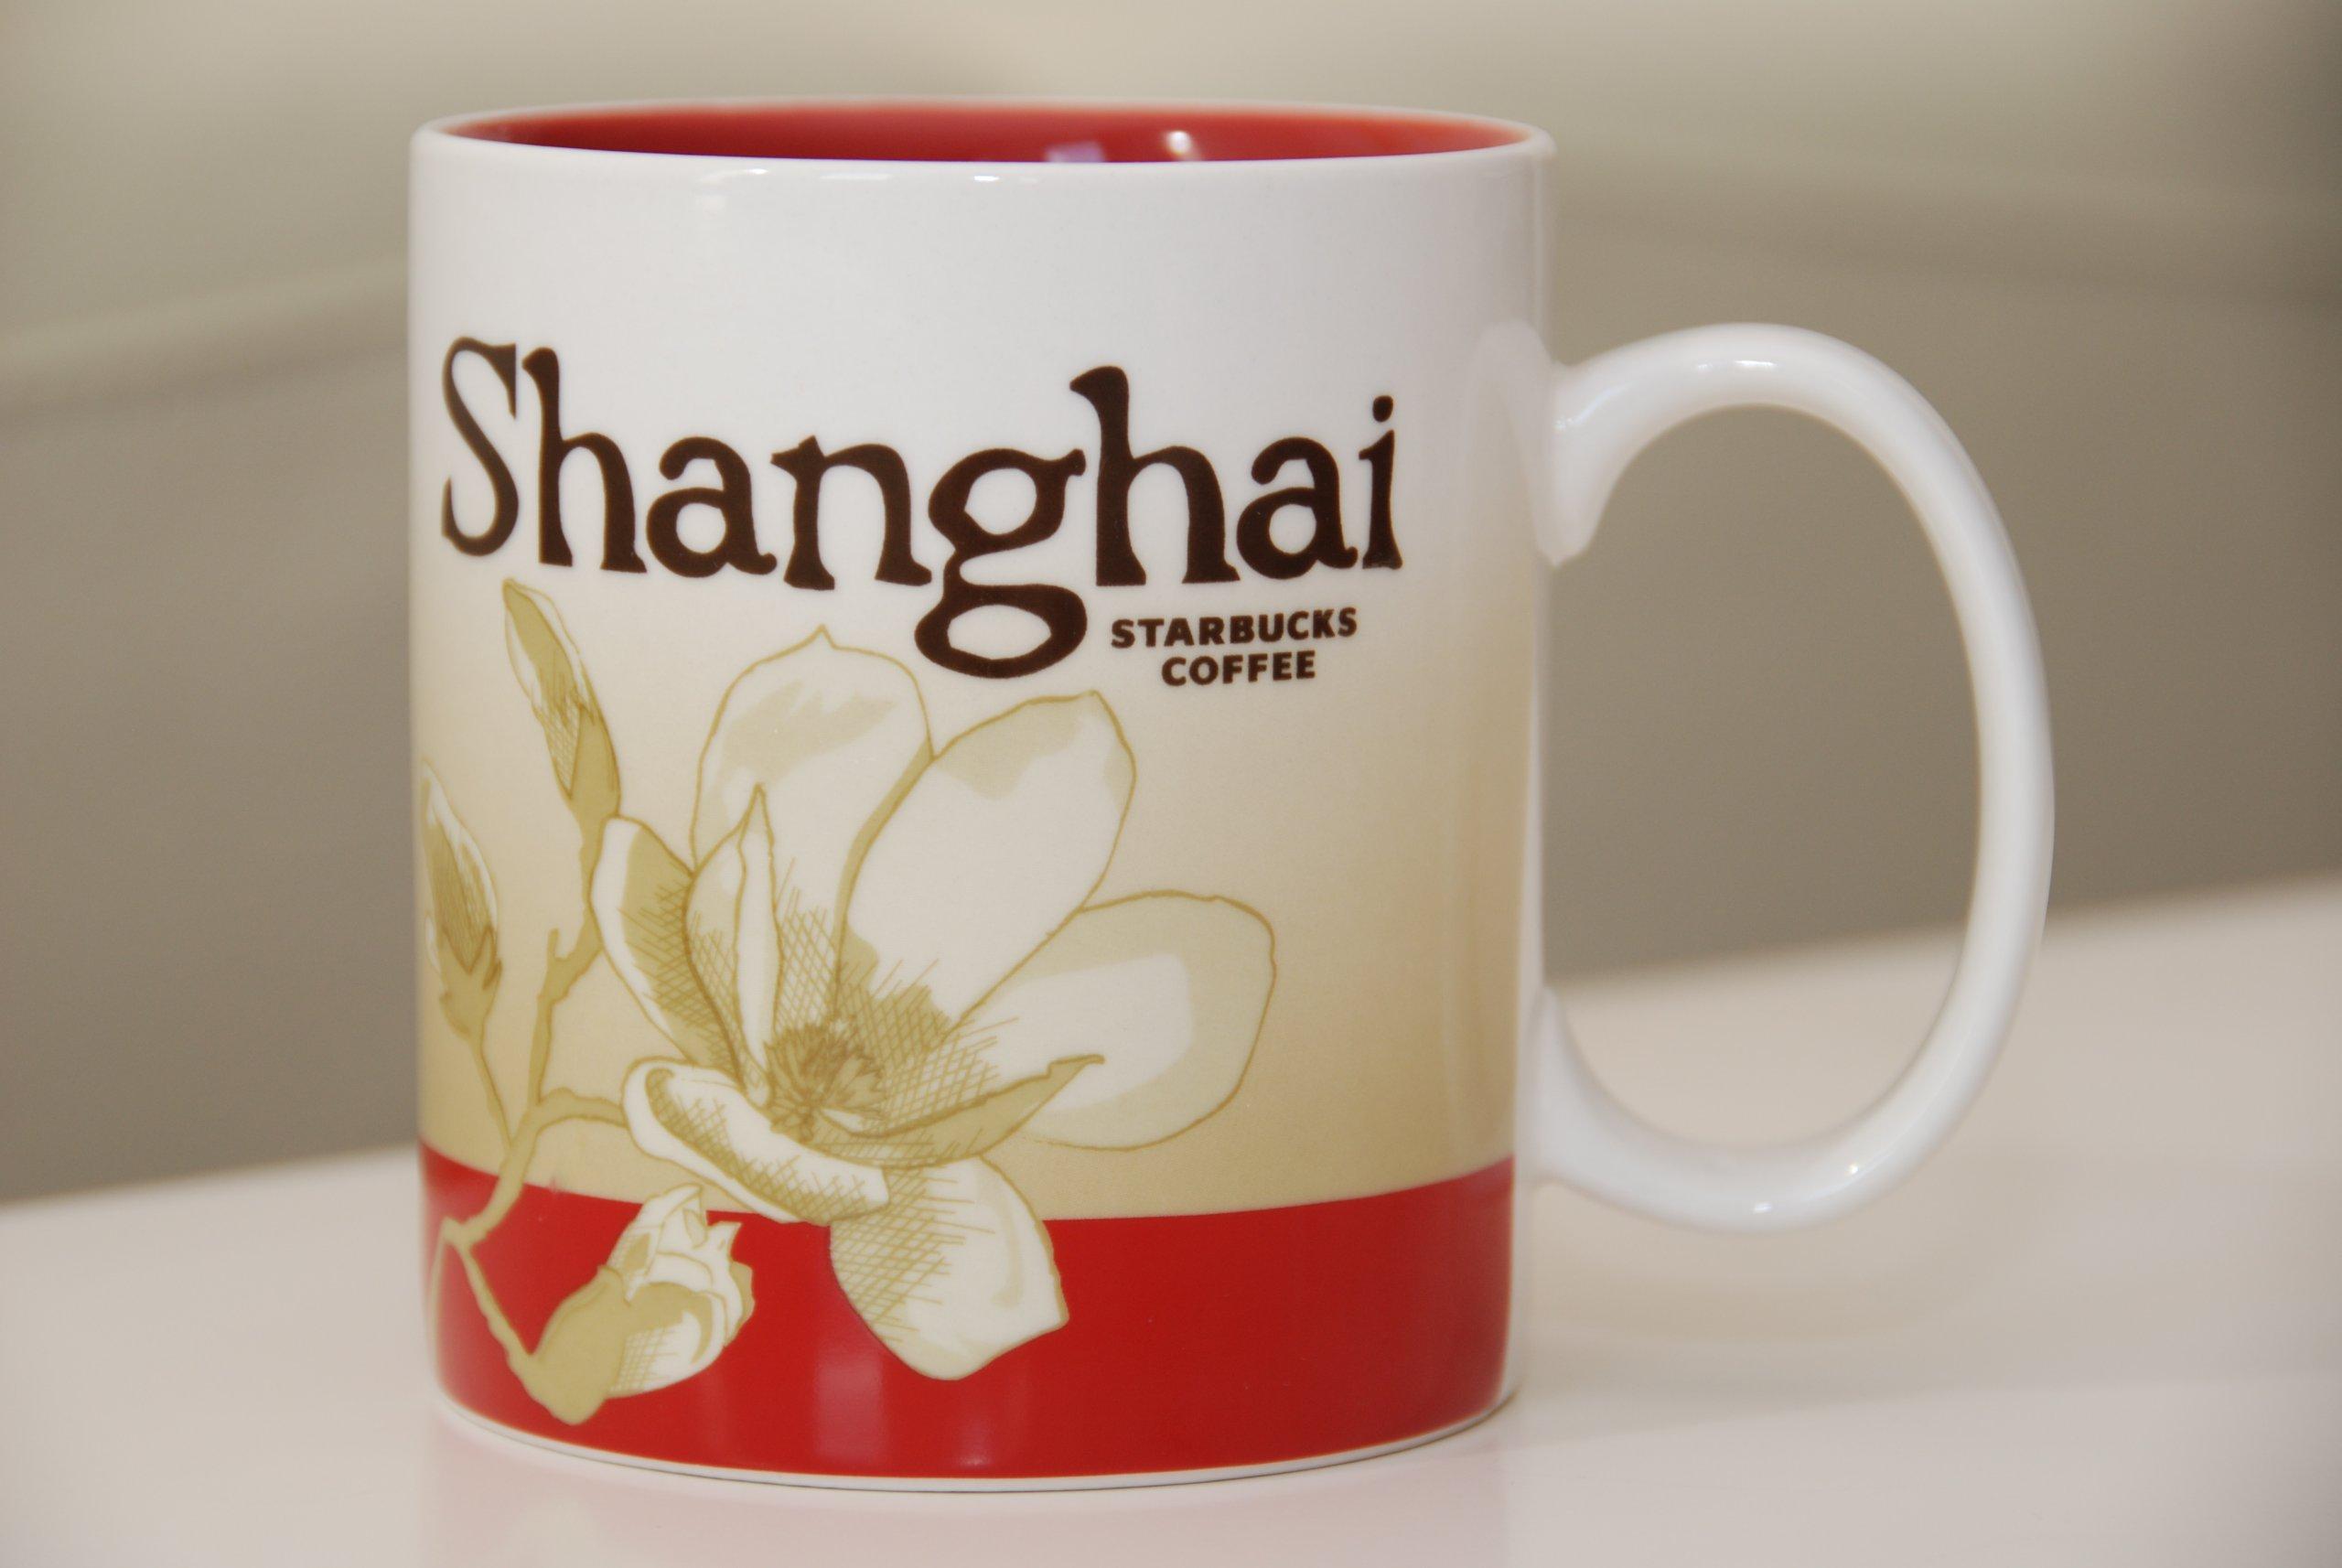 Starbucks Shanghai (China) Global Icon Coffee Tea Mug